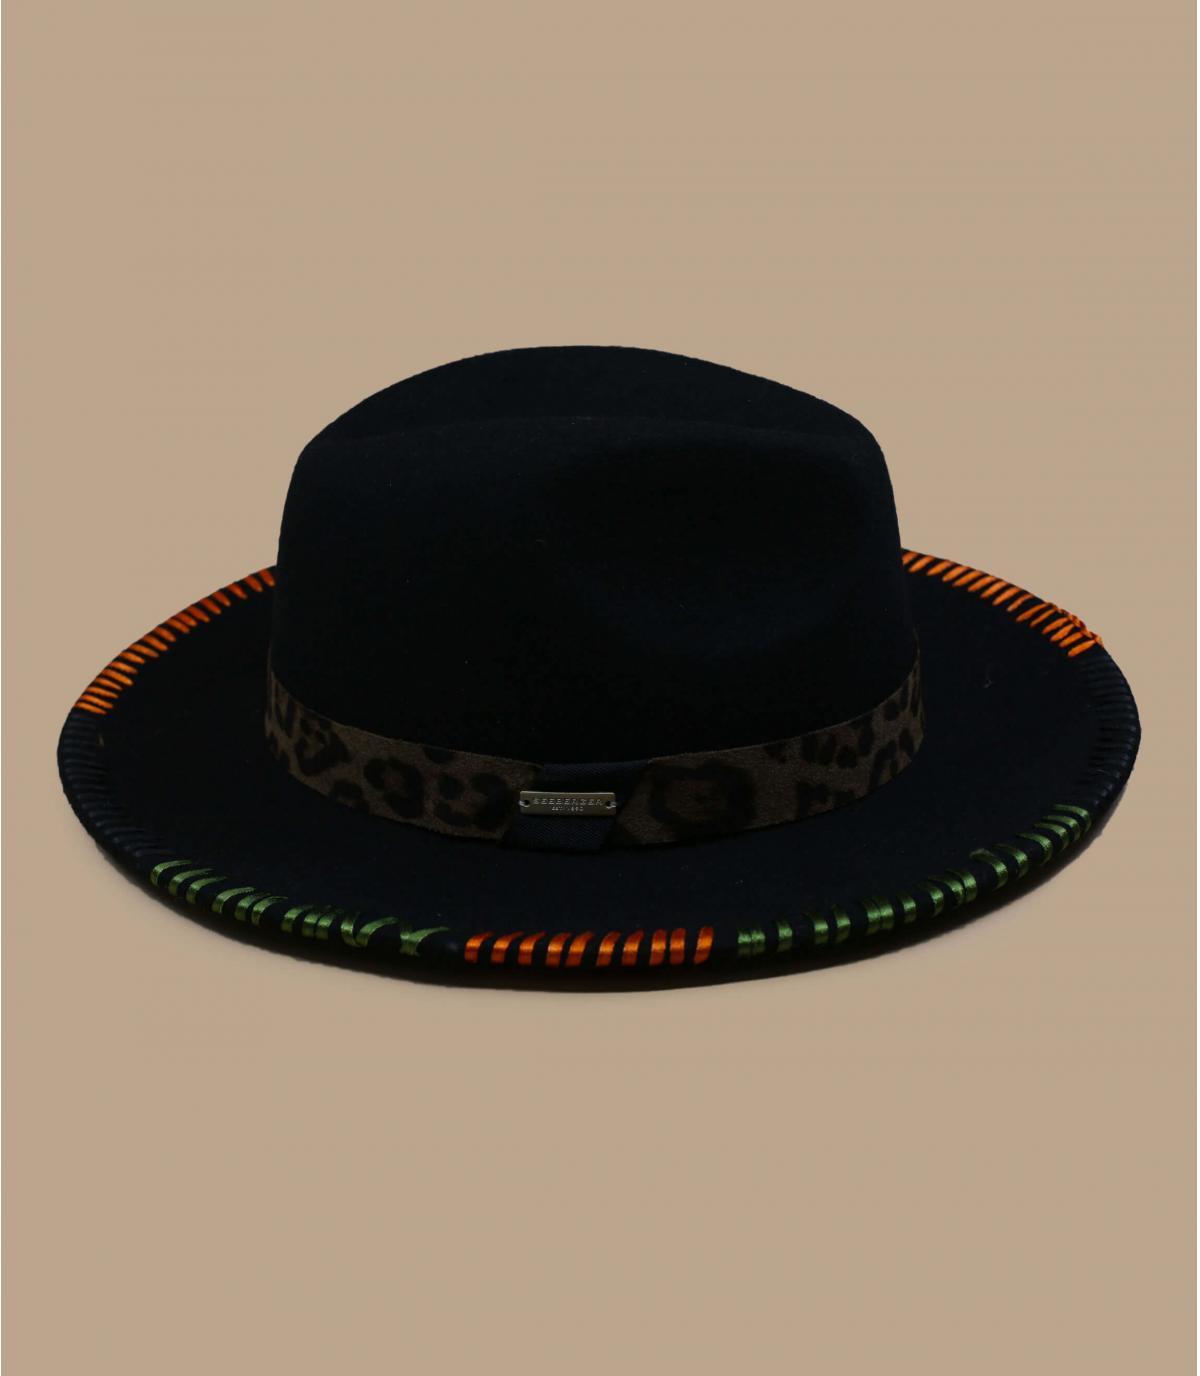 Green felt hat embroidered